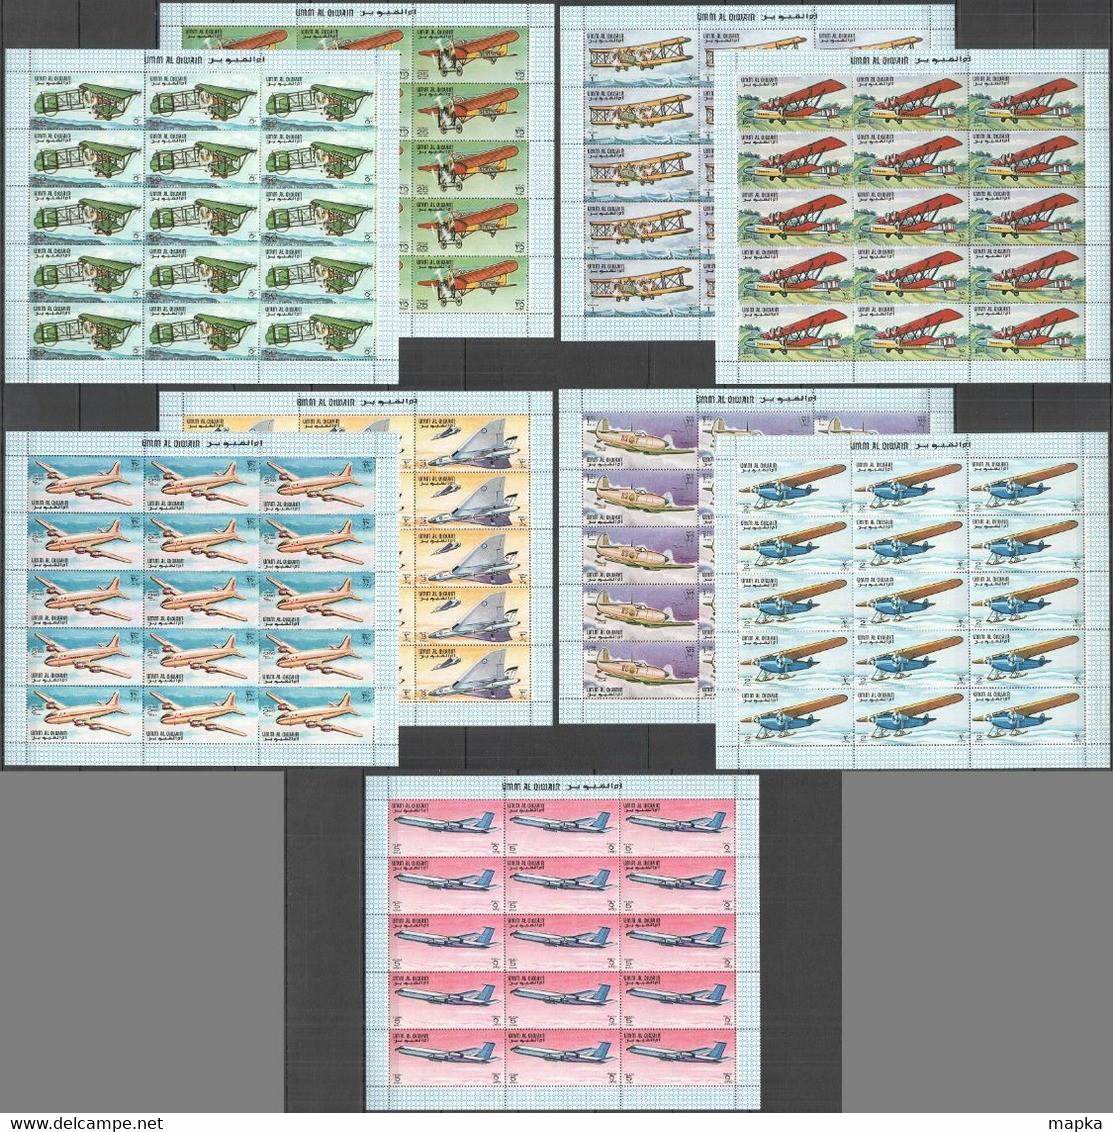 NW0114 1968 UMM AL QIWAIN TRANSPORT AVIATION #296-04 MICHEL 127,5 EURO 15SET MNH - Vliegtuigen